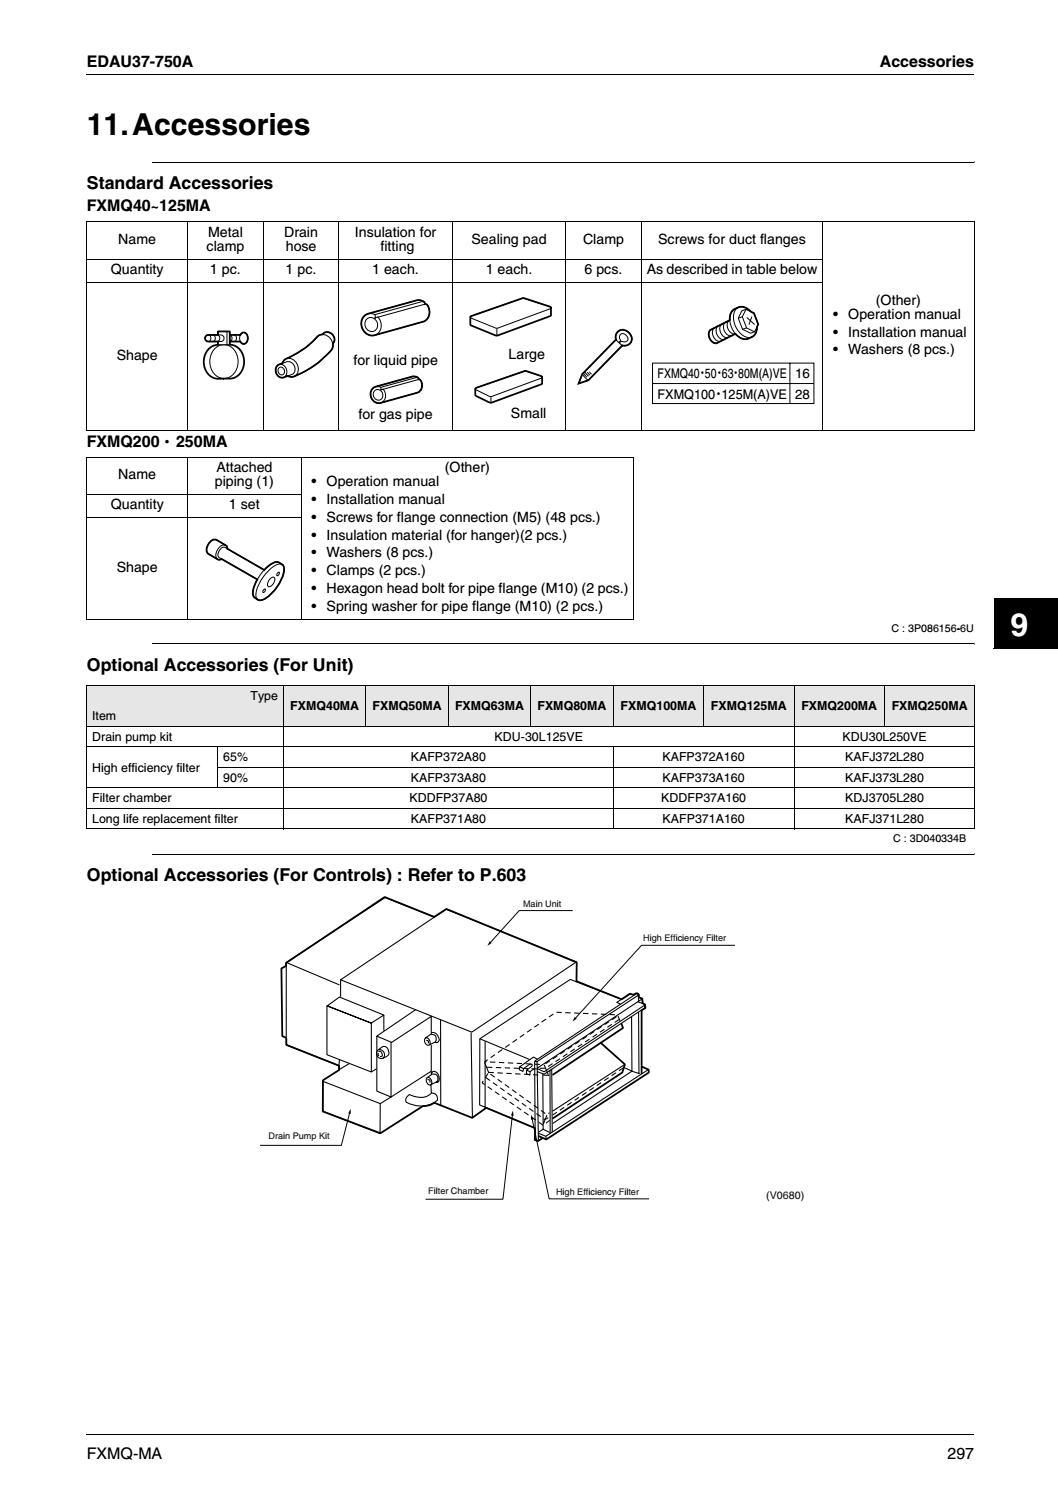 Daikin engineering data vrviii edau37 750a 1[1] by